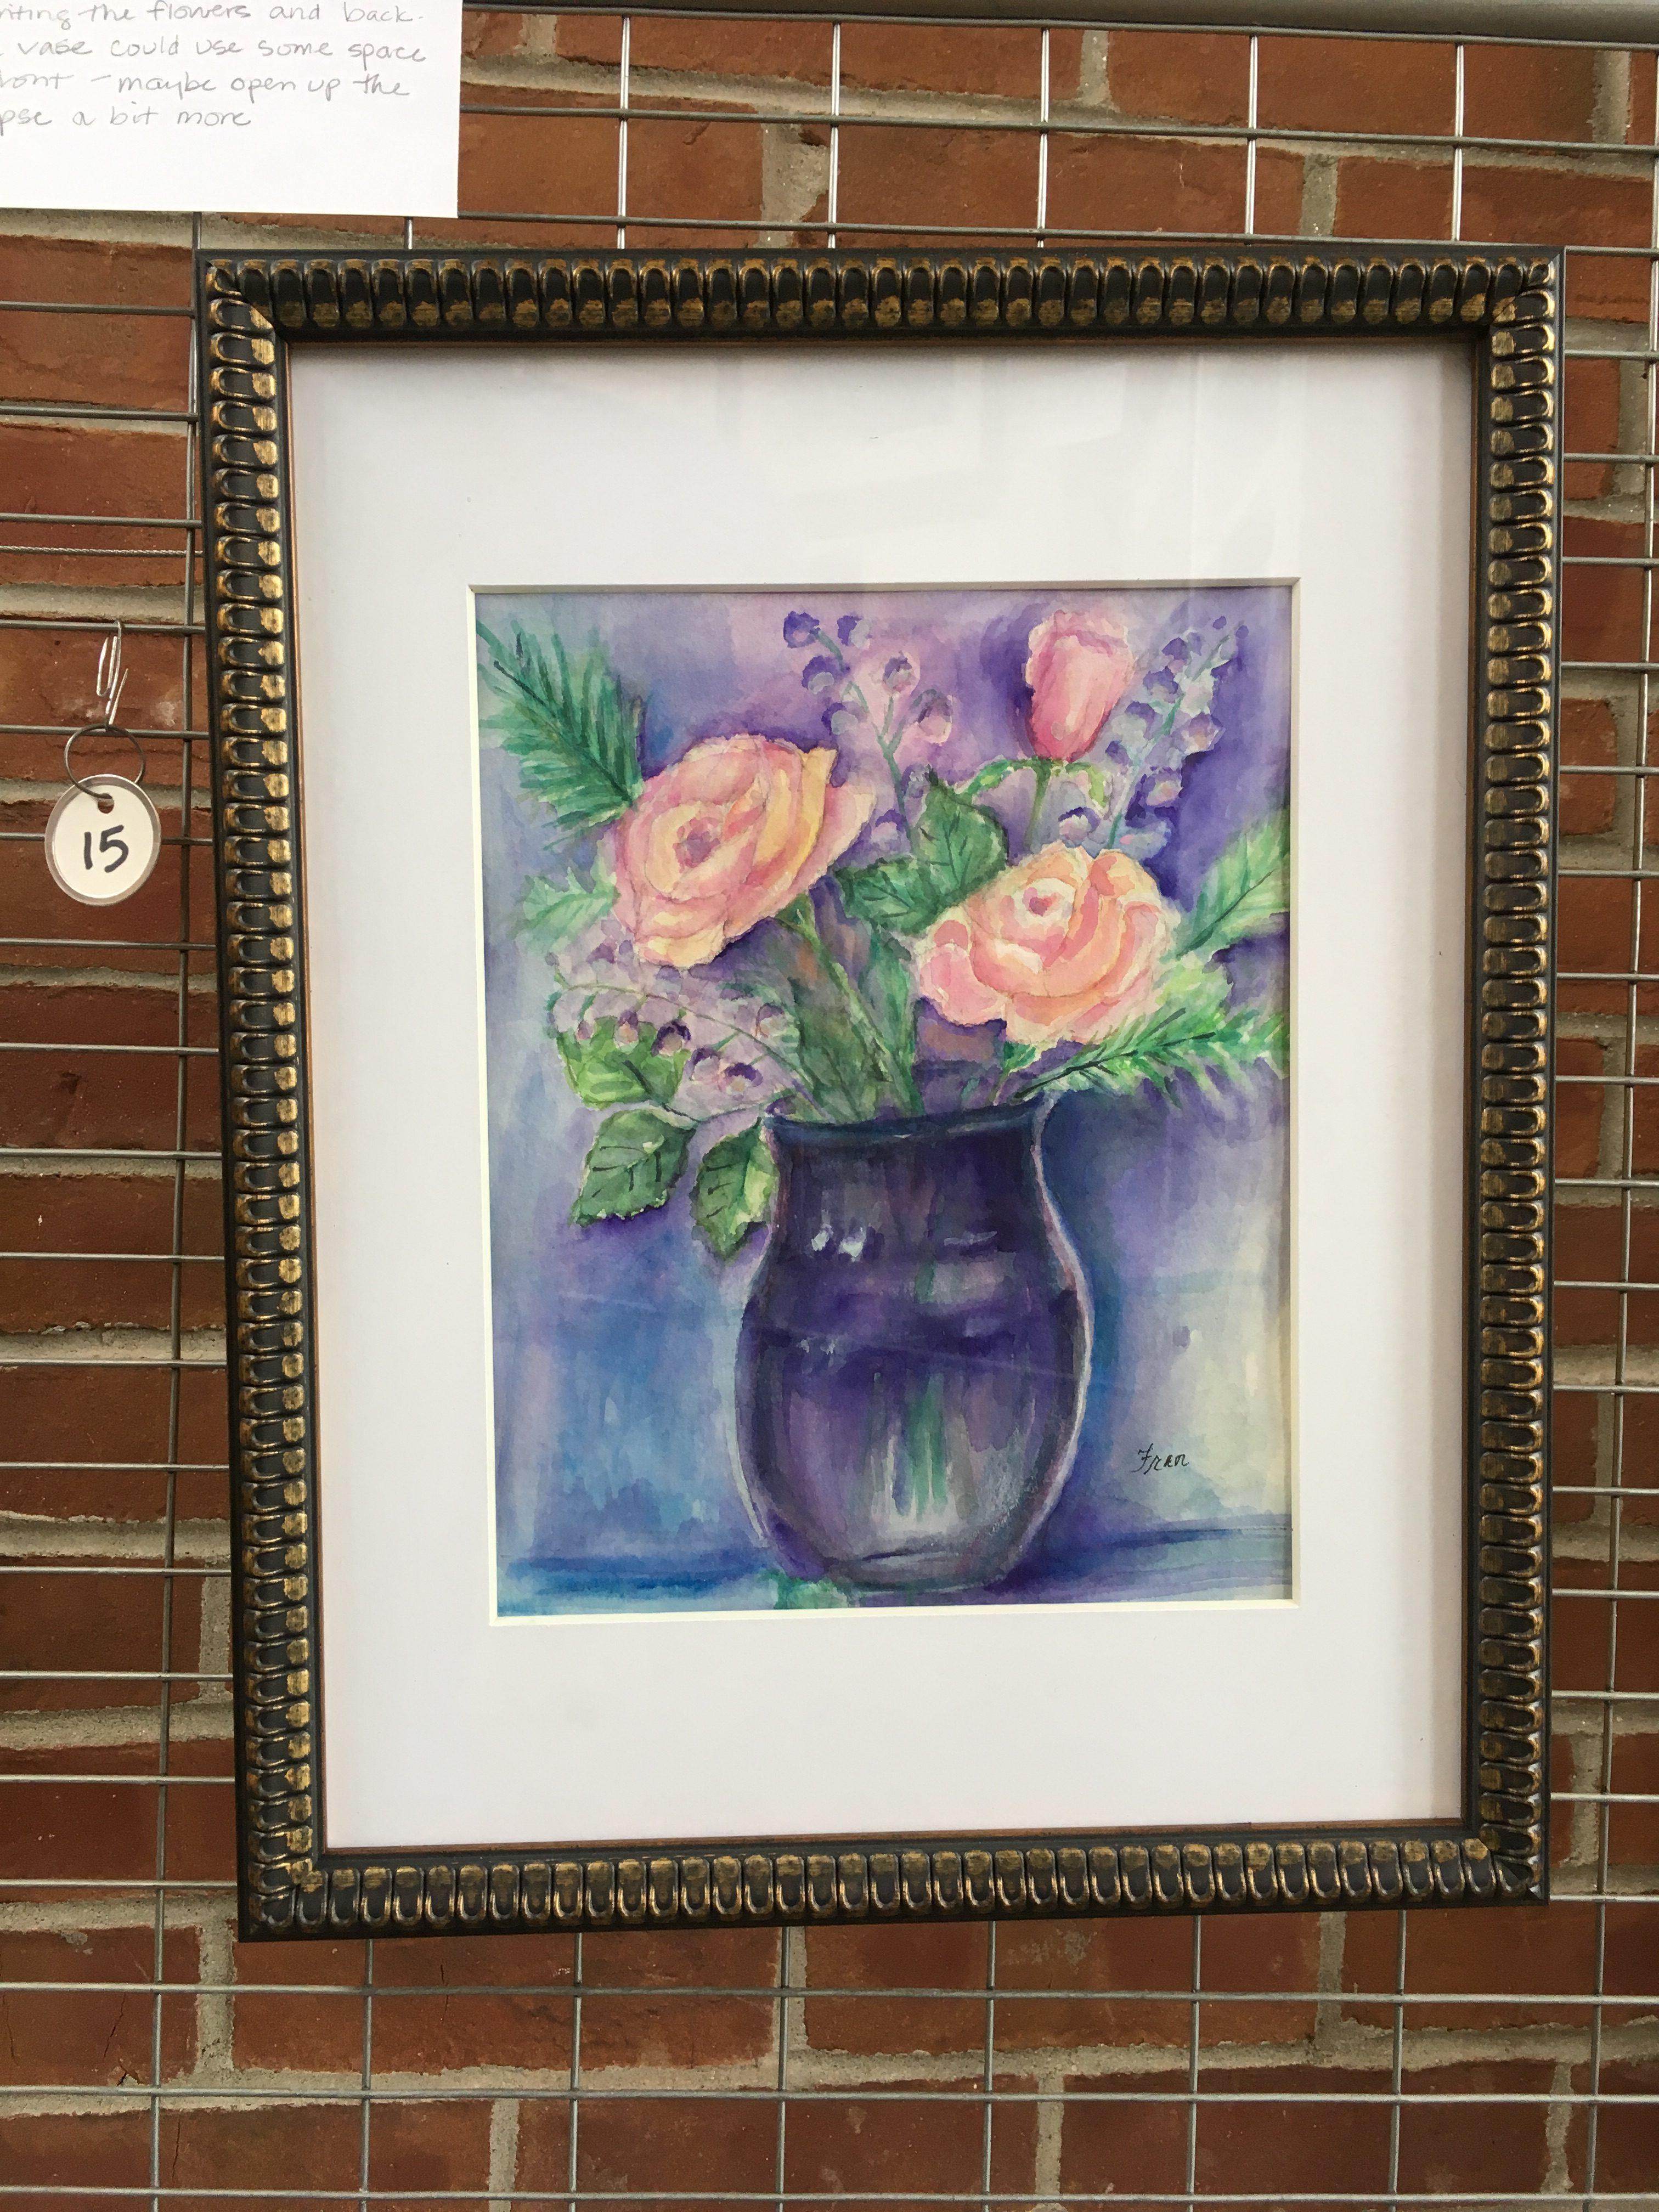 Rose in Bloom -- Fran Guzzardi